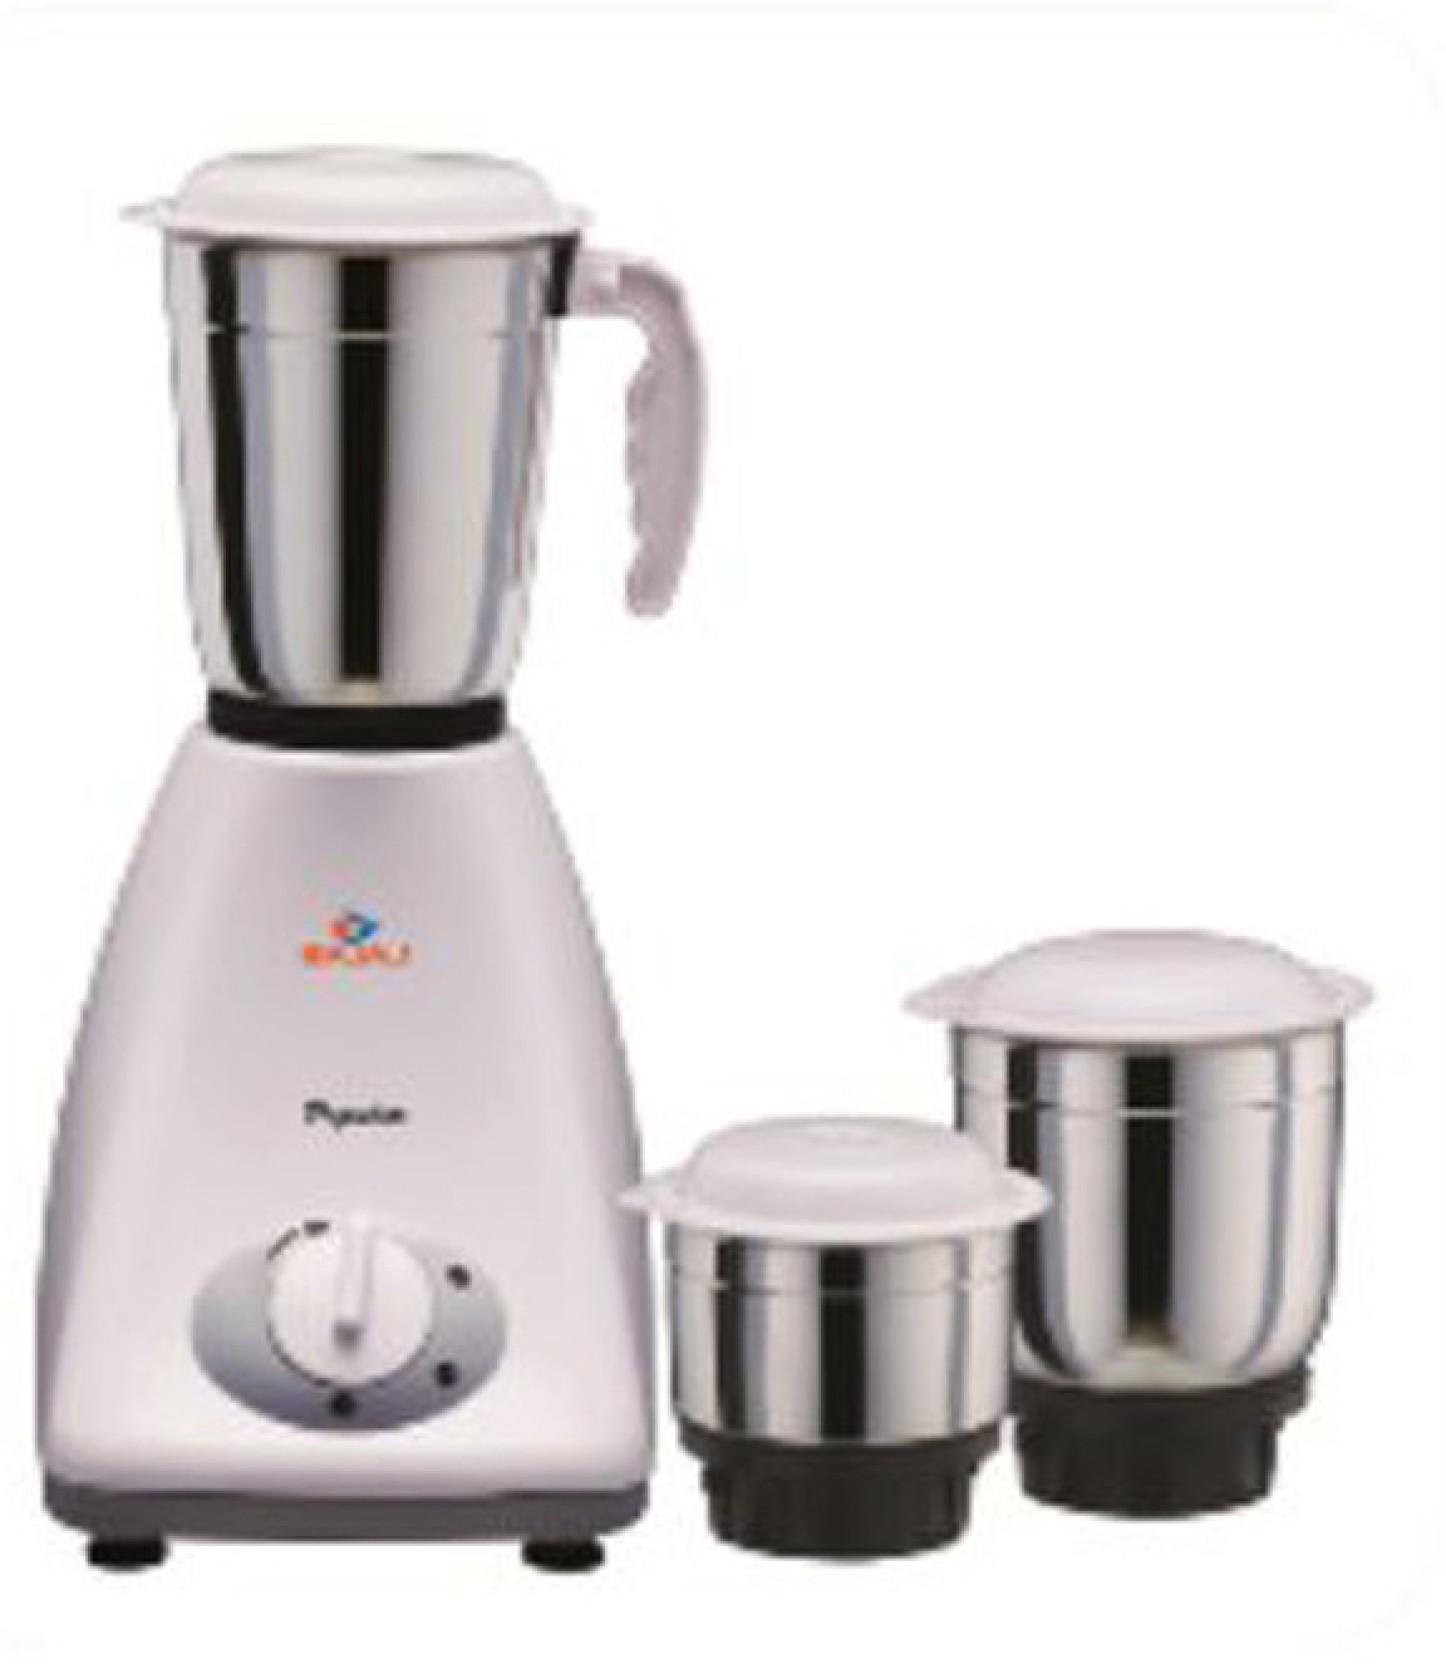 Bajaj Popular 450 W Mixer Grinder Price In India Buy Philips Rice Cooker Hd 3118 32 Add To Cart